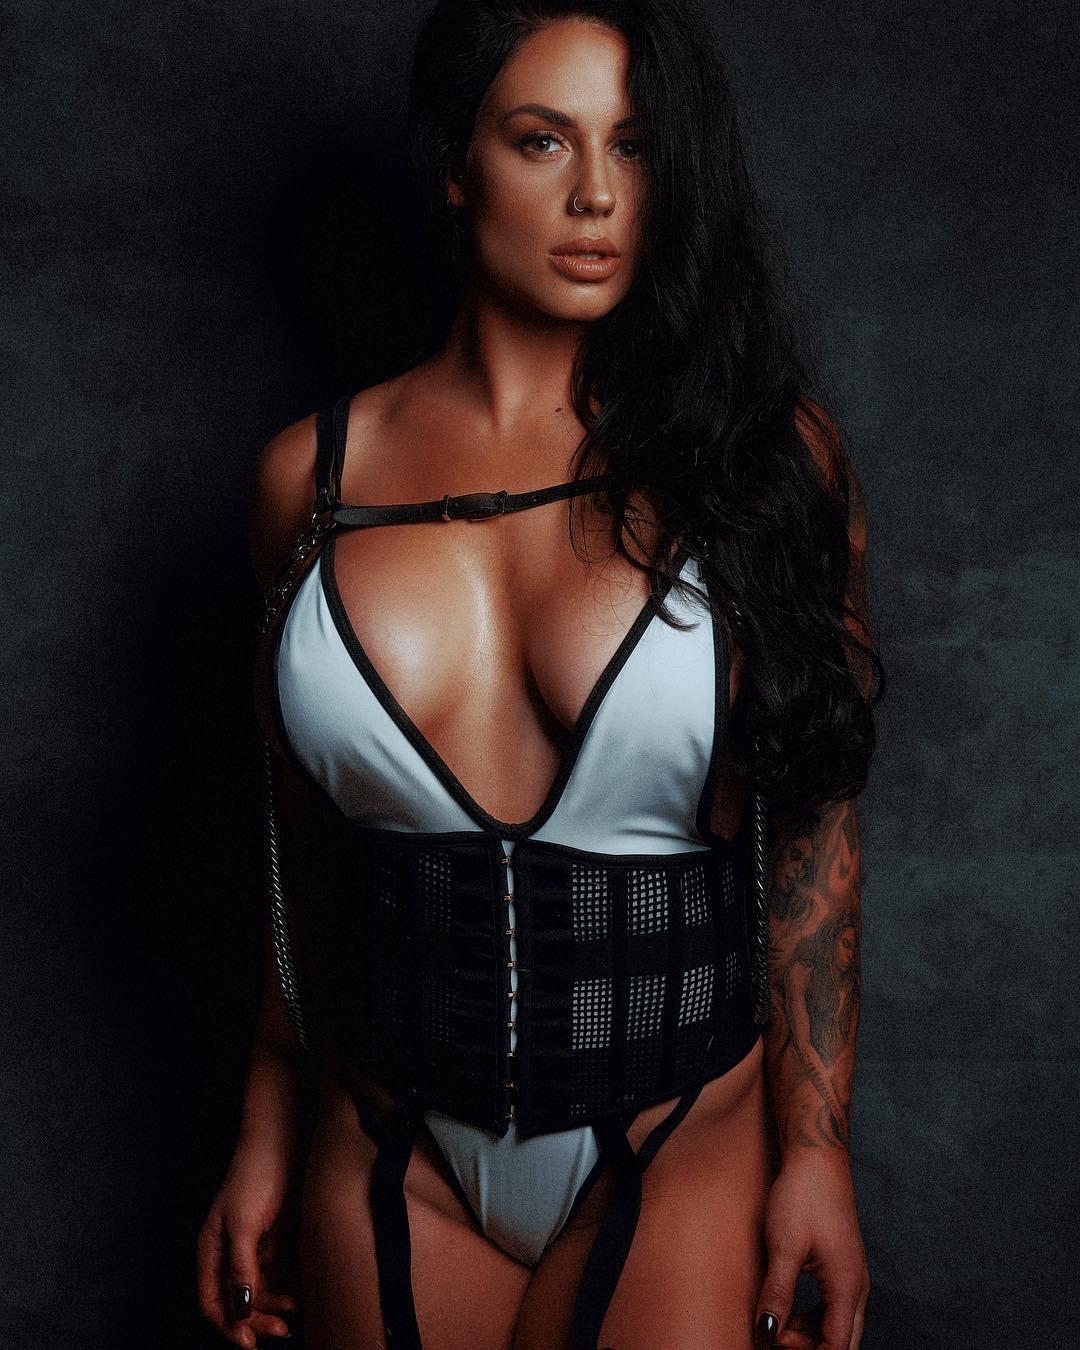 Kaitlyn big tits (1)